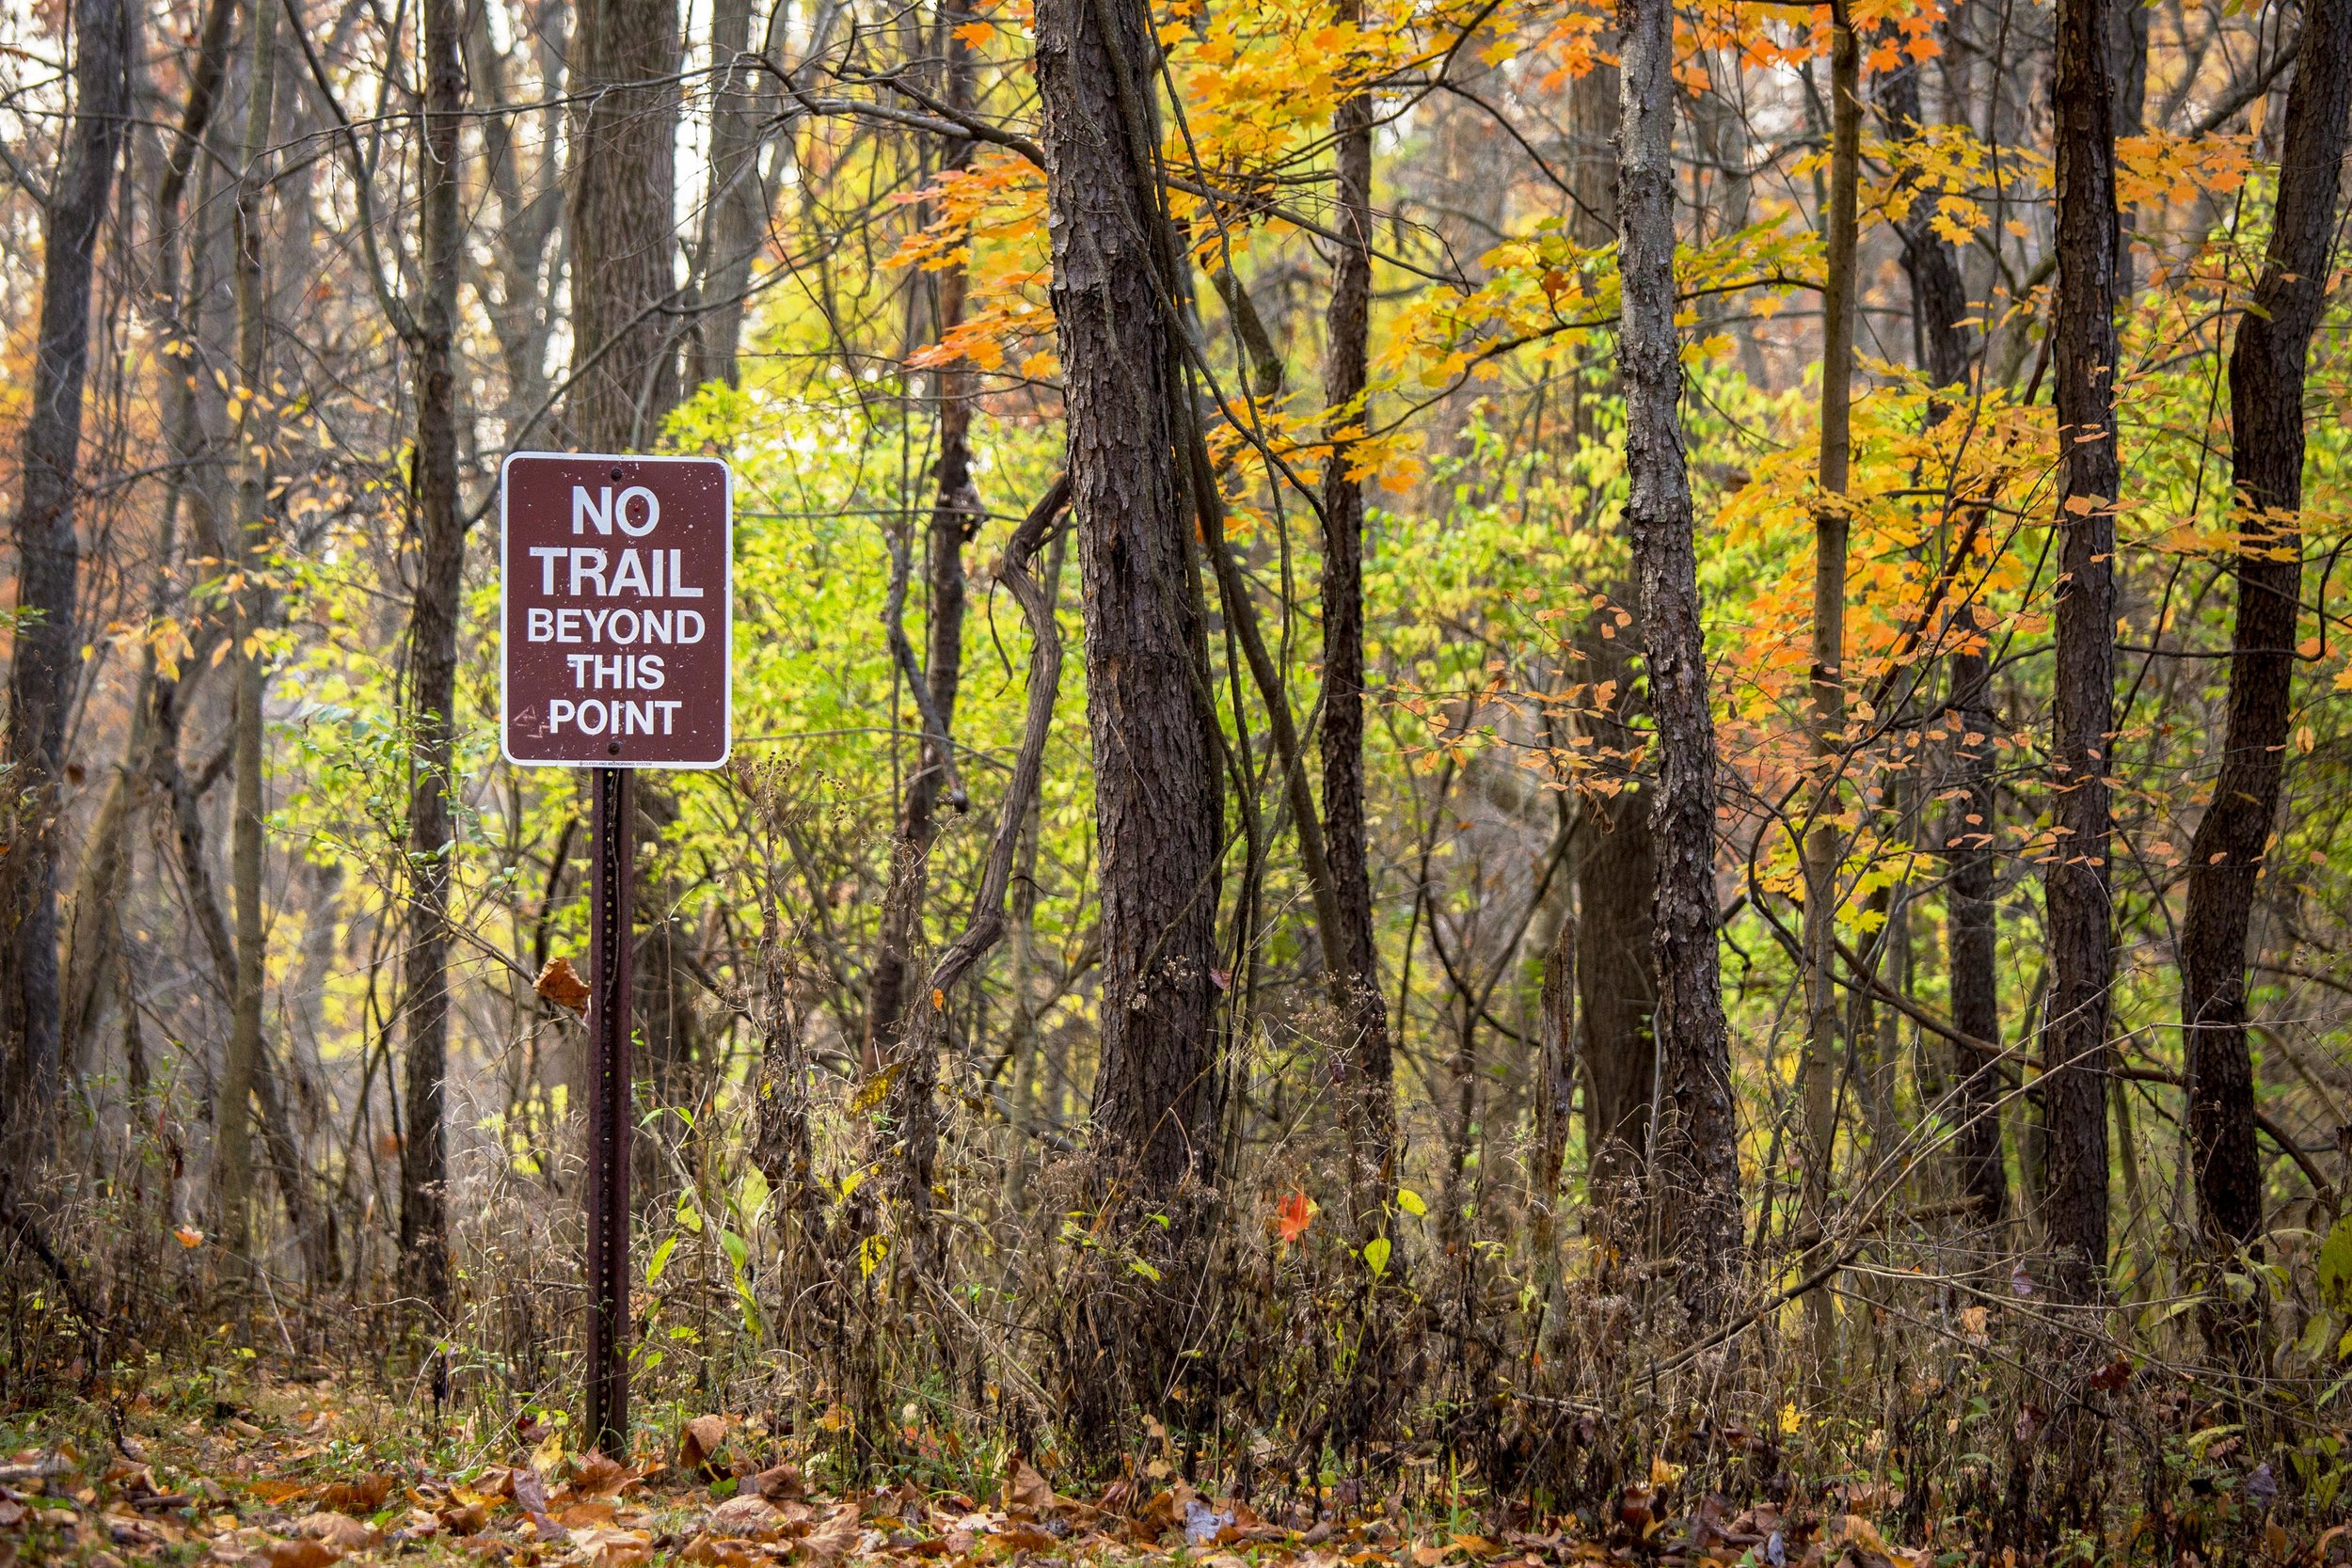 Lake Isaac Trail, Berea, Ohio - Photo by Todd Sechel